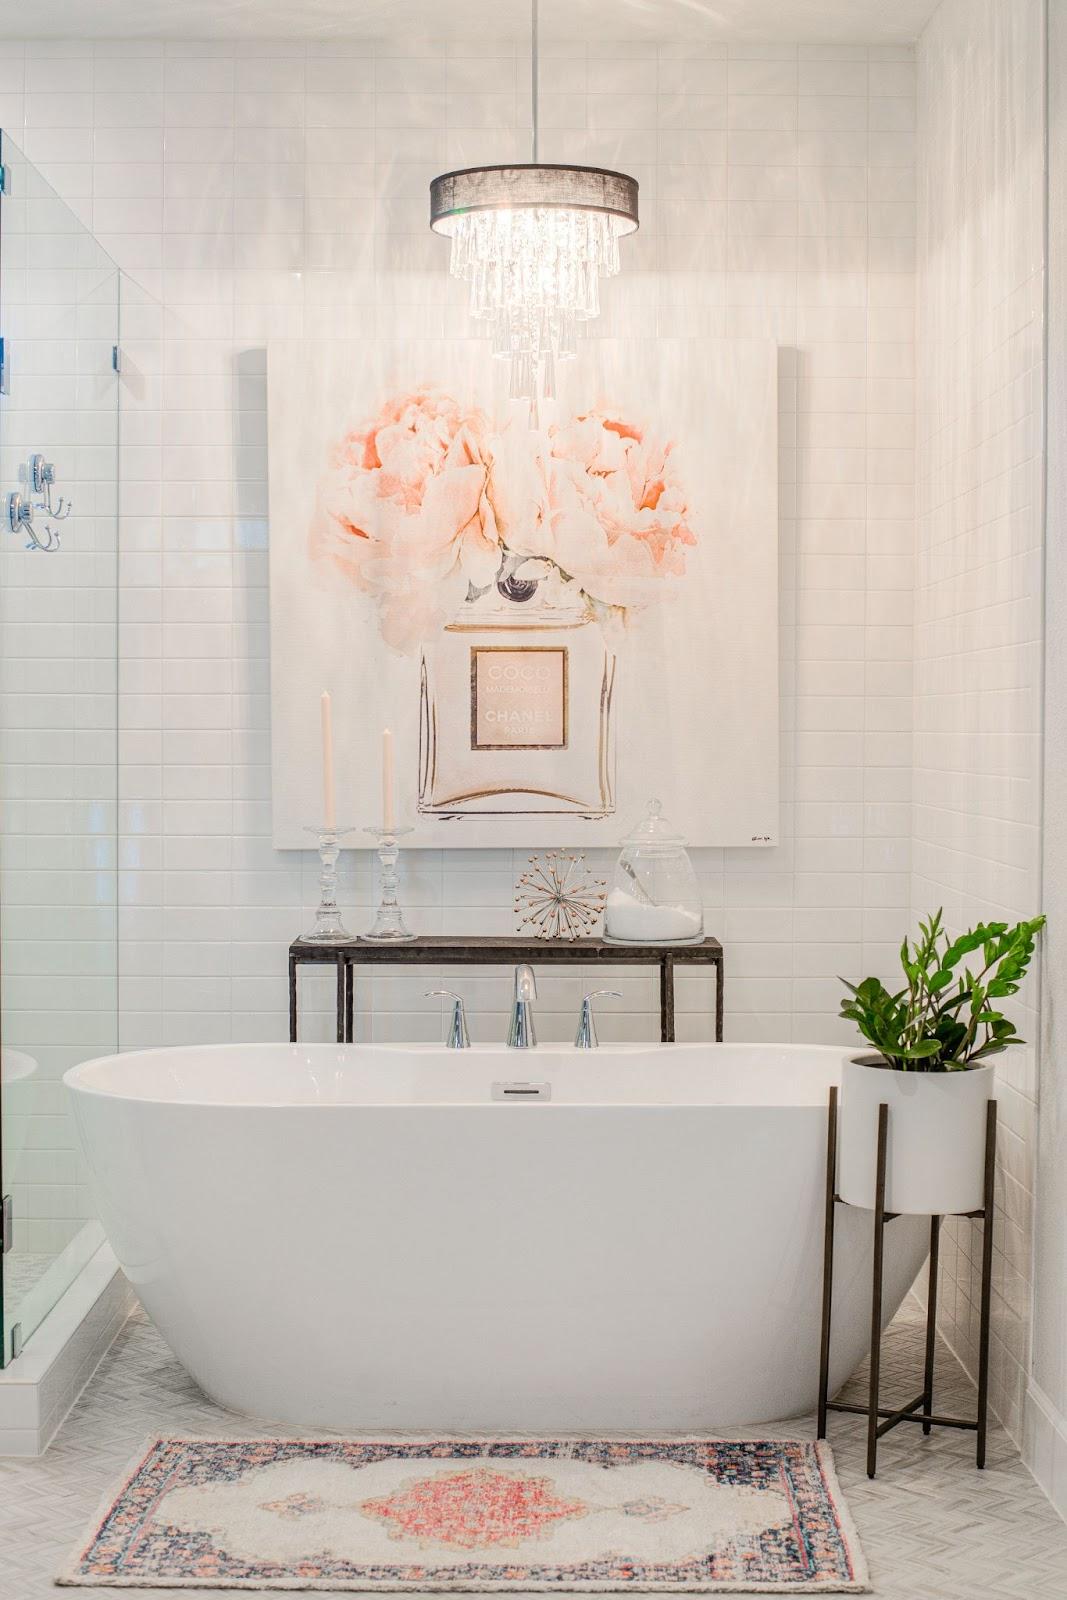 builder-grade home after custom interior design freestanding bathtub and art